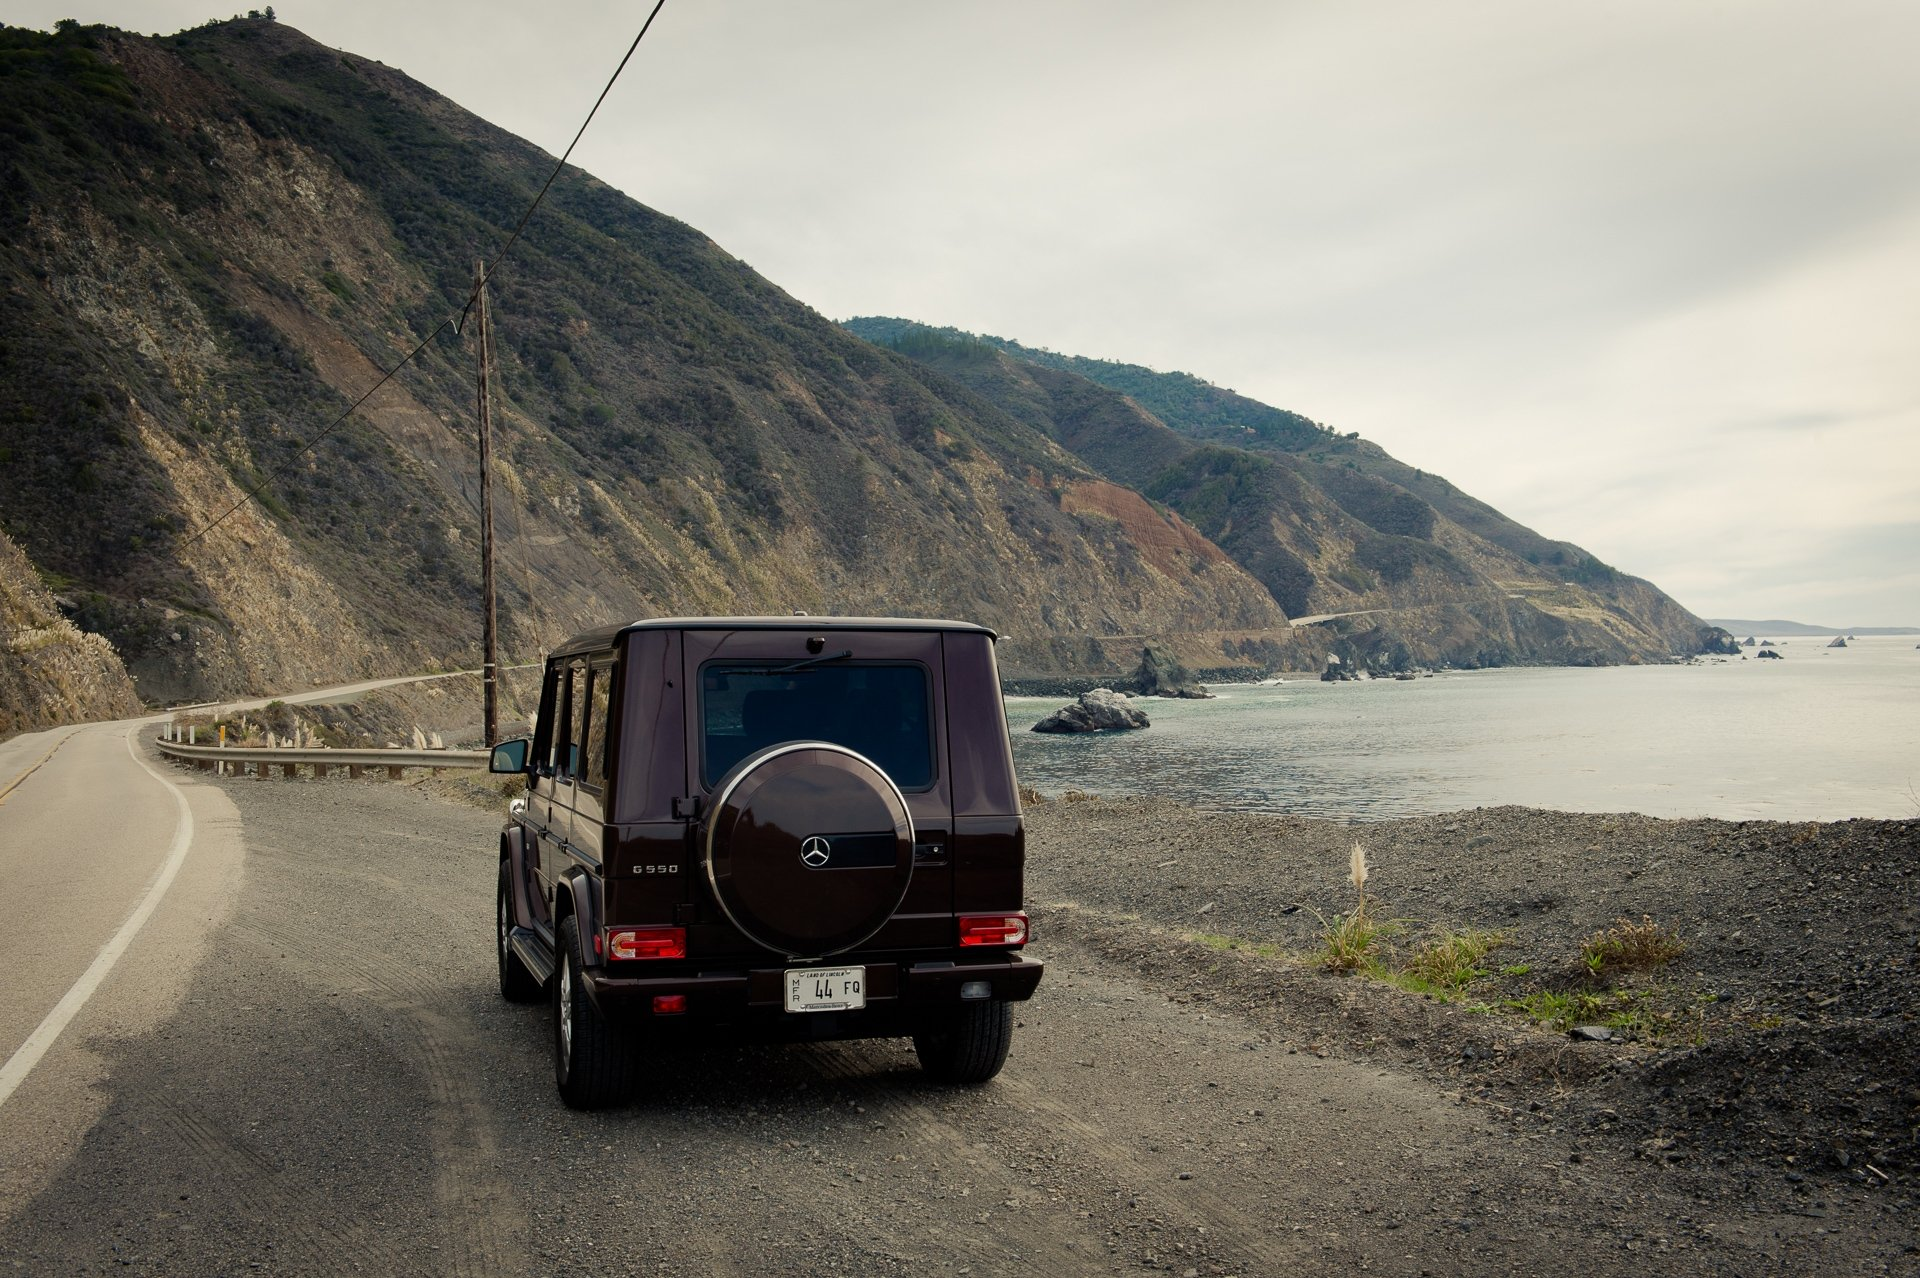 2014-Mercedes-Benz-G500-G550-braun-Kalifornien-mbrt14-04